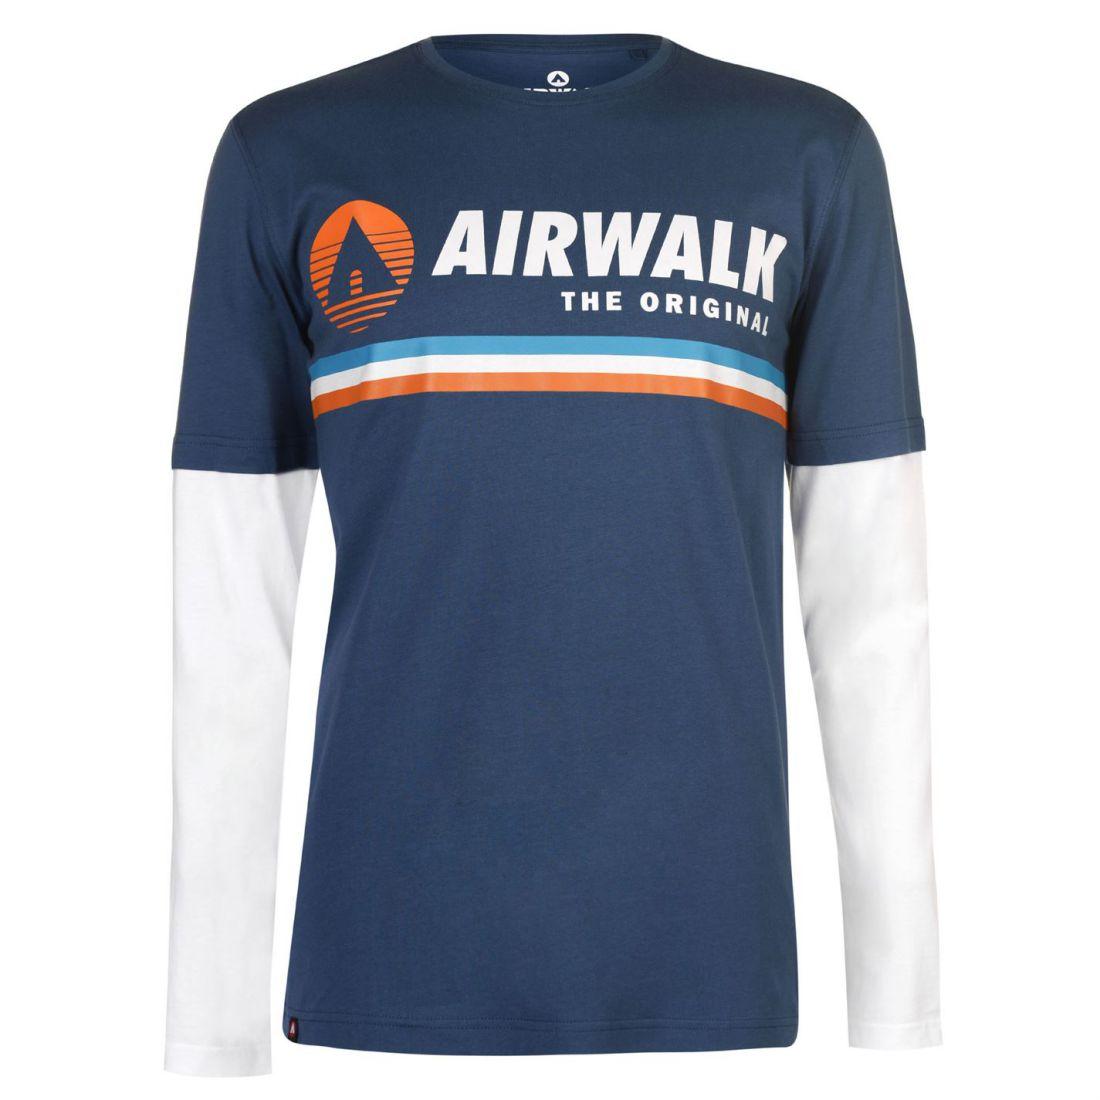 Airwalk ORIG Couche T Mens Gents Shirt pleine longueur manches